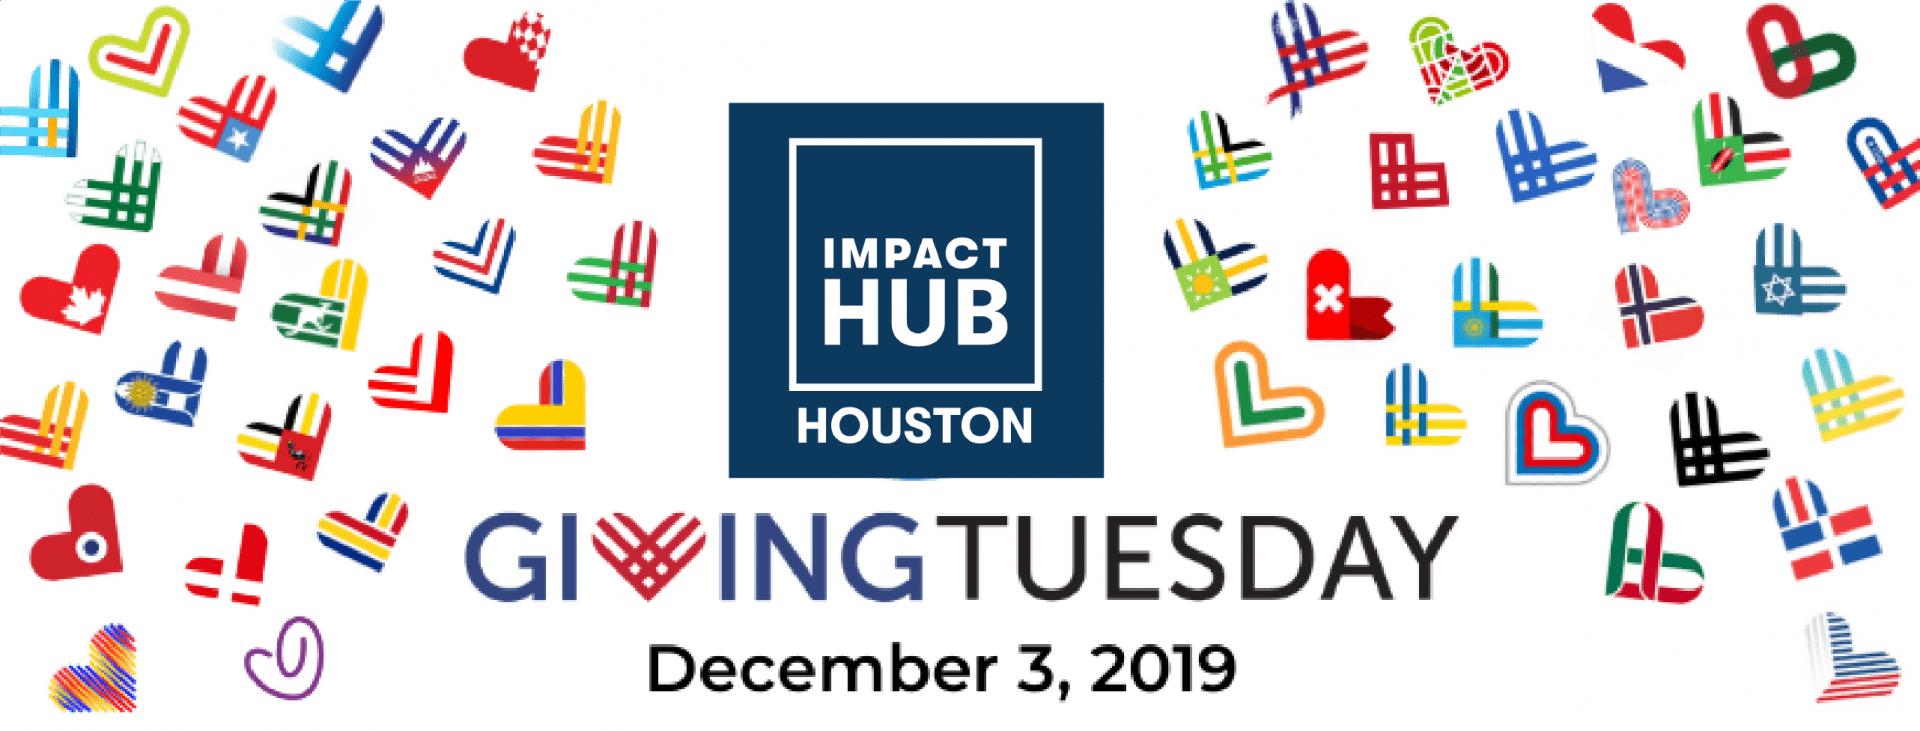 GivingTuesday Impact Hub Houston banner